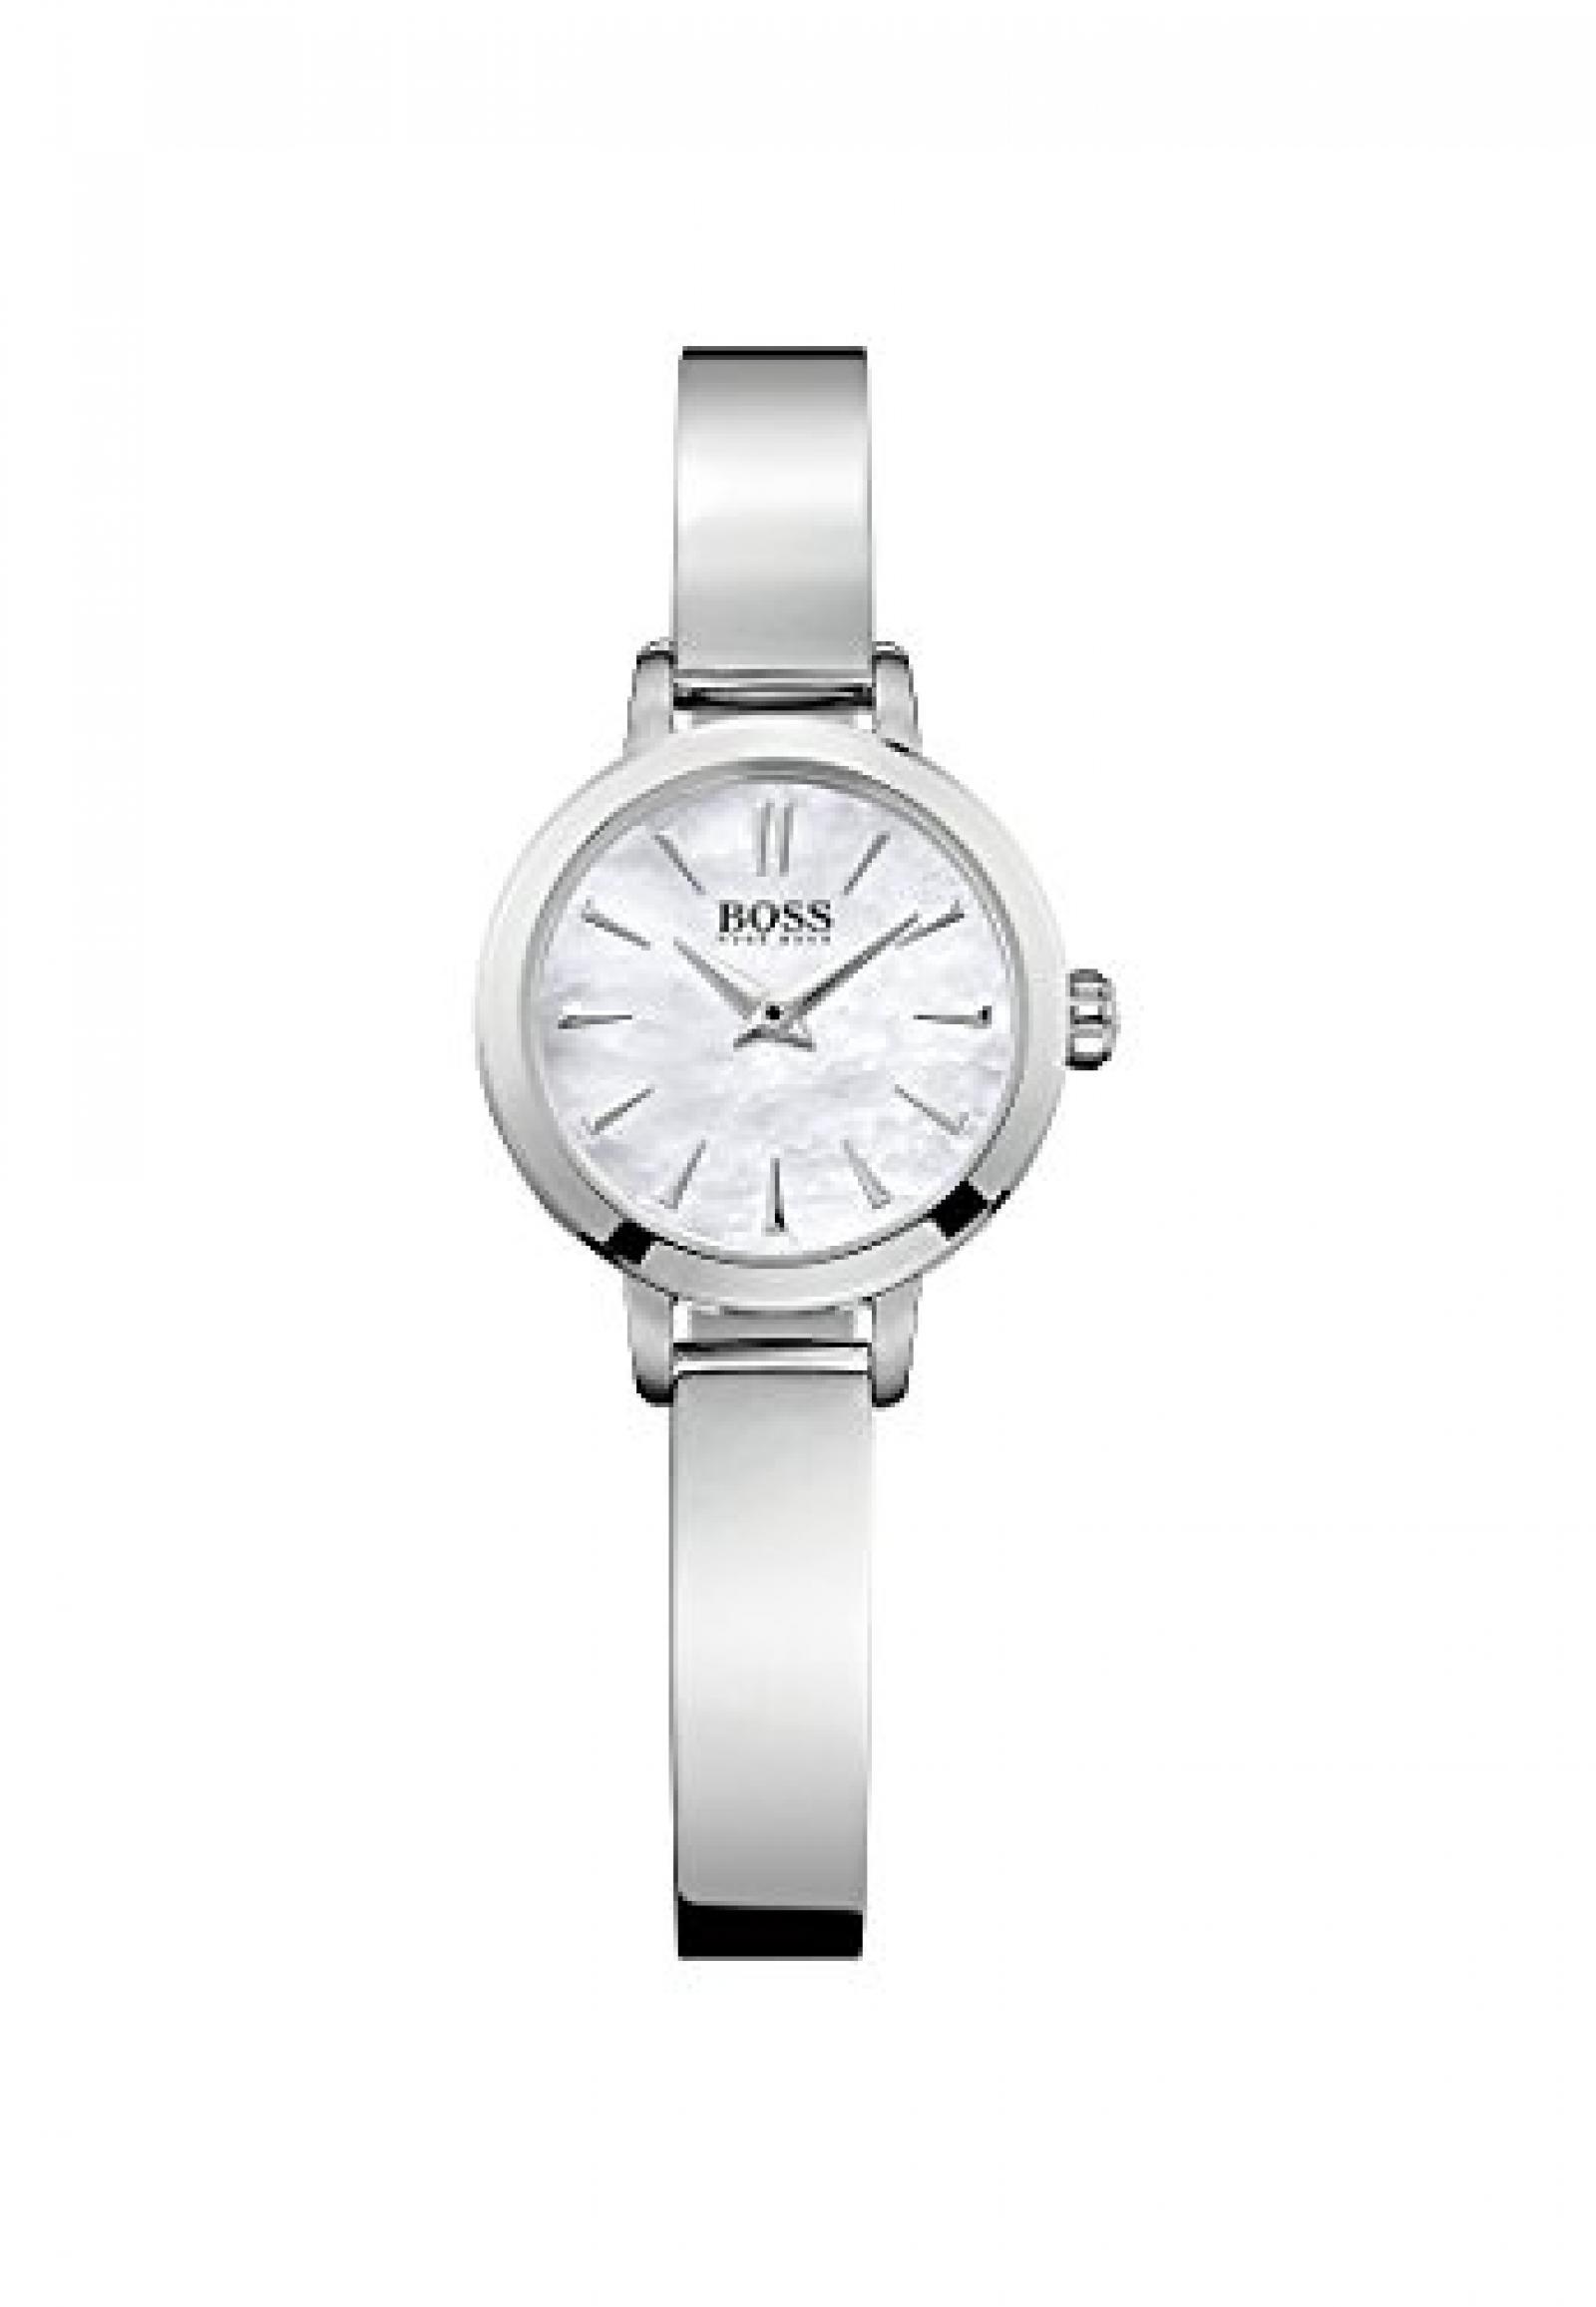 BOSS Damen-Armbanduhr Analog Quarz (One Size, perlmutt)